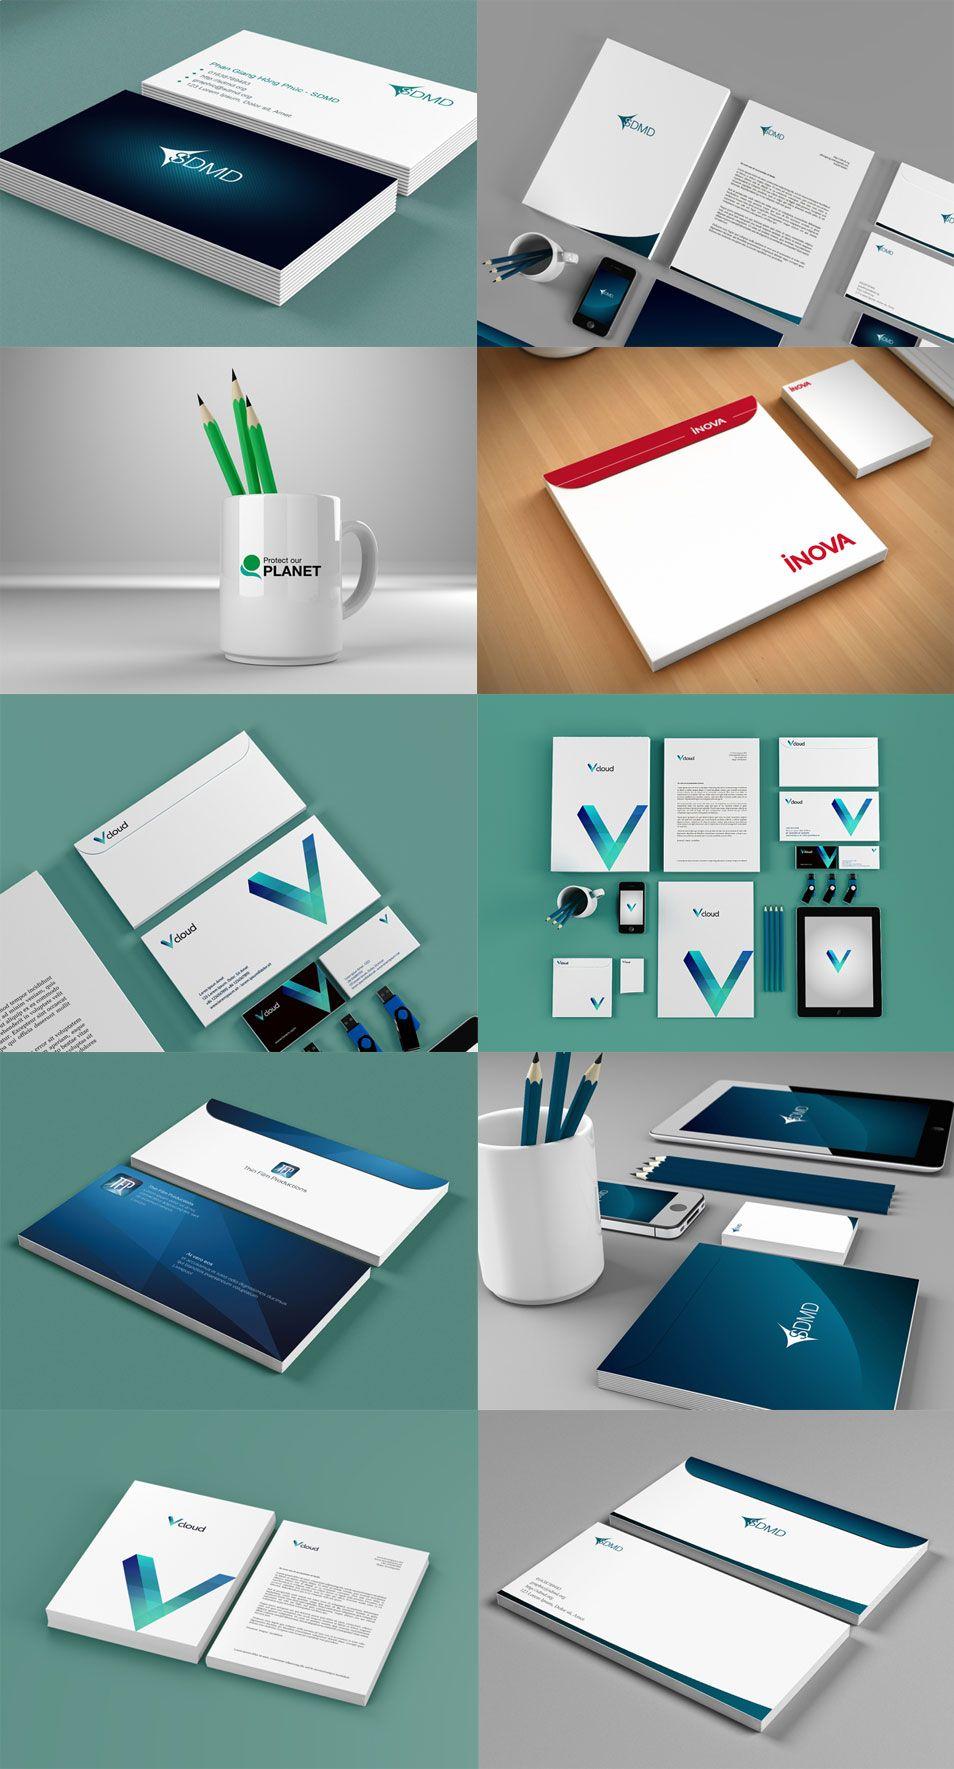 500 Free Mockup Templates Psd Designs Css Author Graphic Design Mockup Branding Mockups Free Mockup Templates